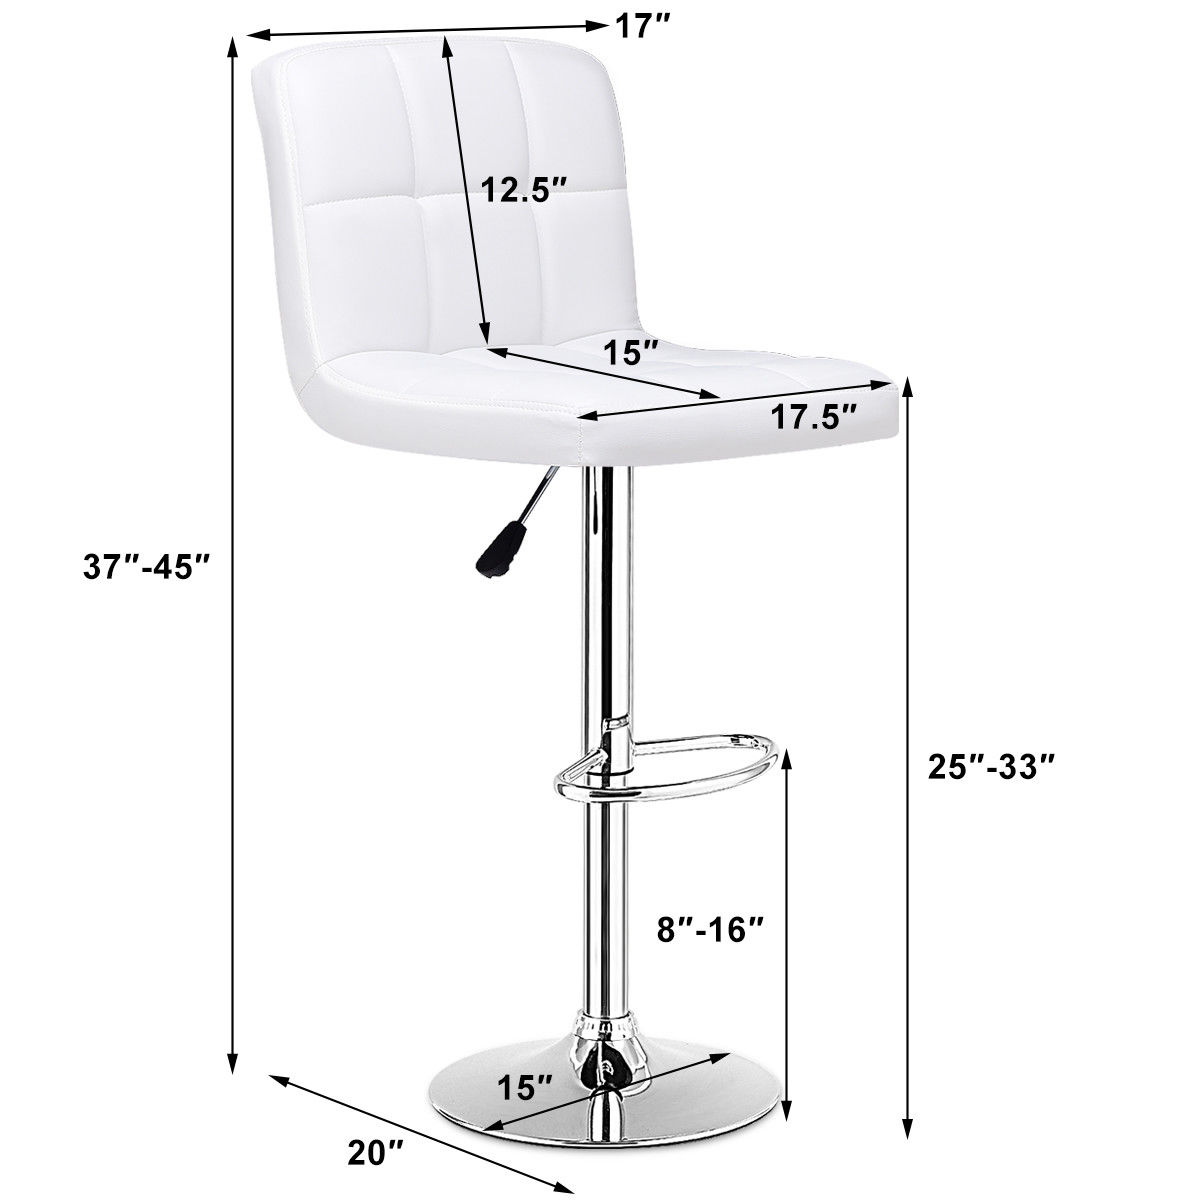 Set Of 2 Bar Stools PU Leather Adjustable Barstool Swivel Pub Chairs White - image 2 de 10